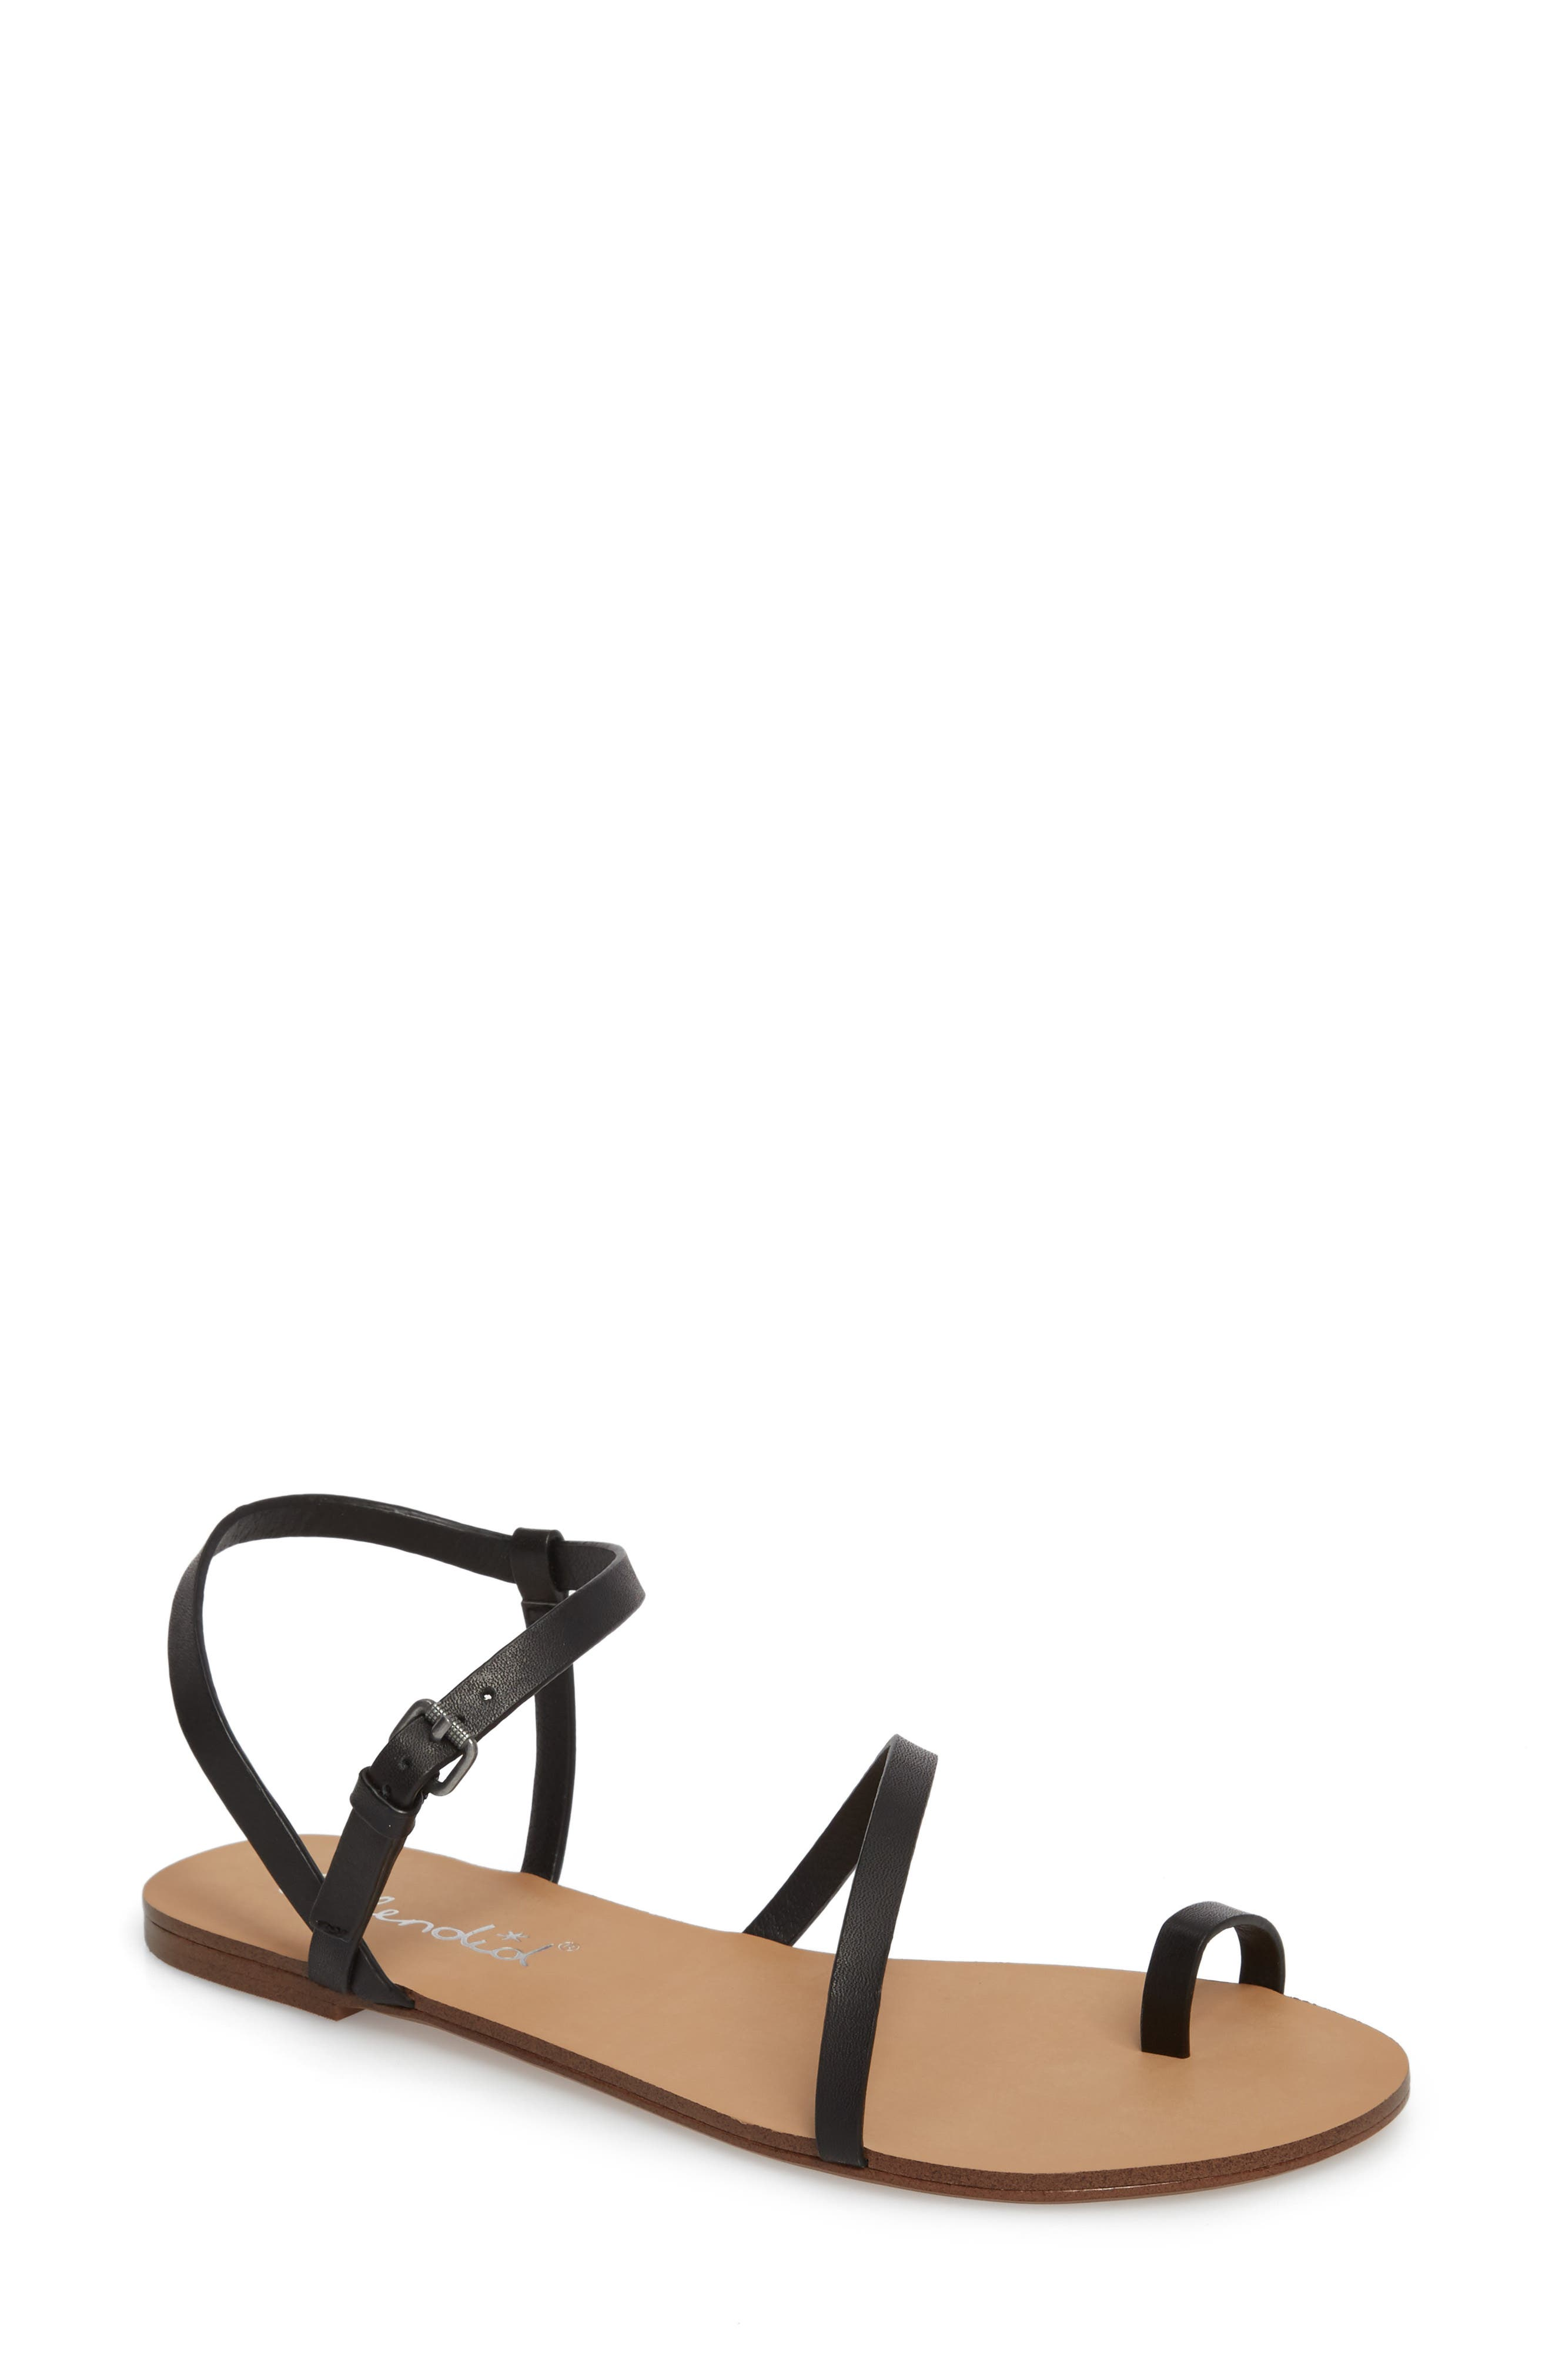 Flower Sandal,                             Main thumbnail 1, color,                             Black Leather